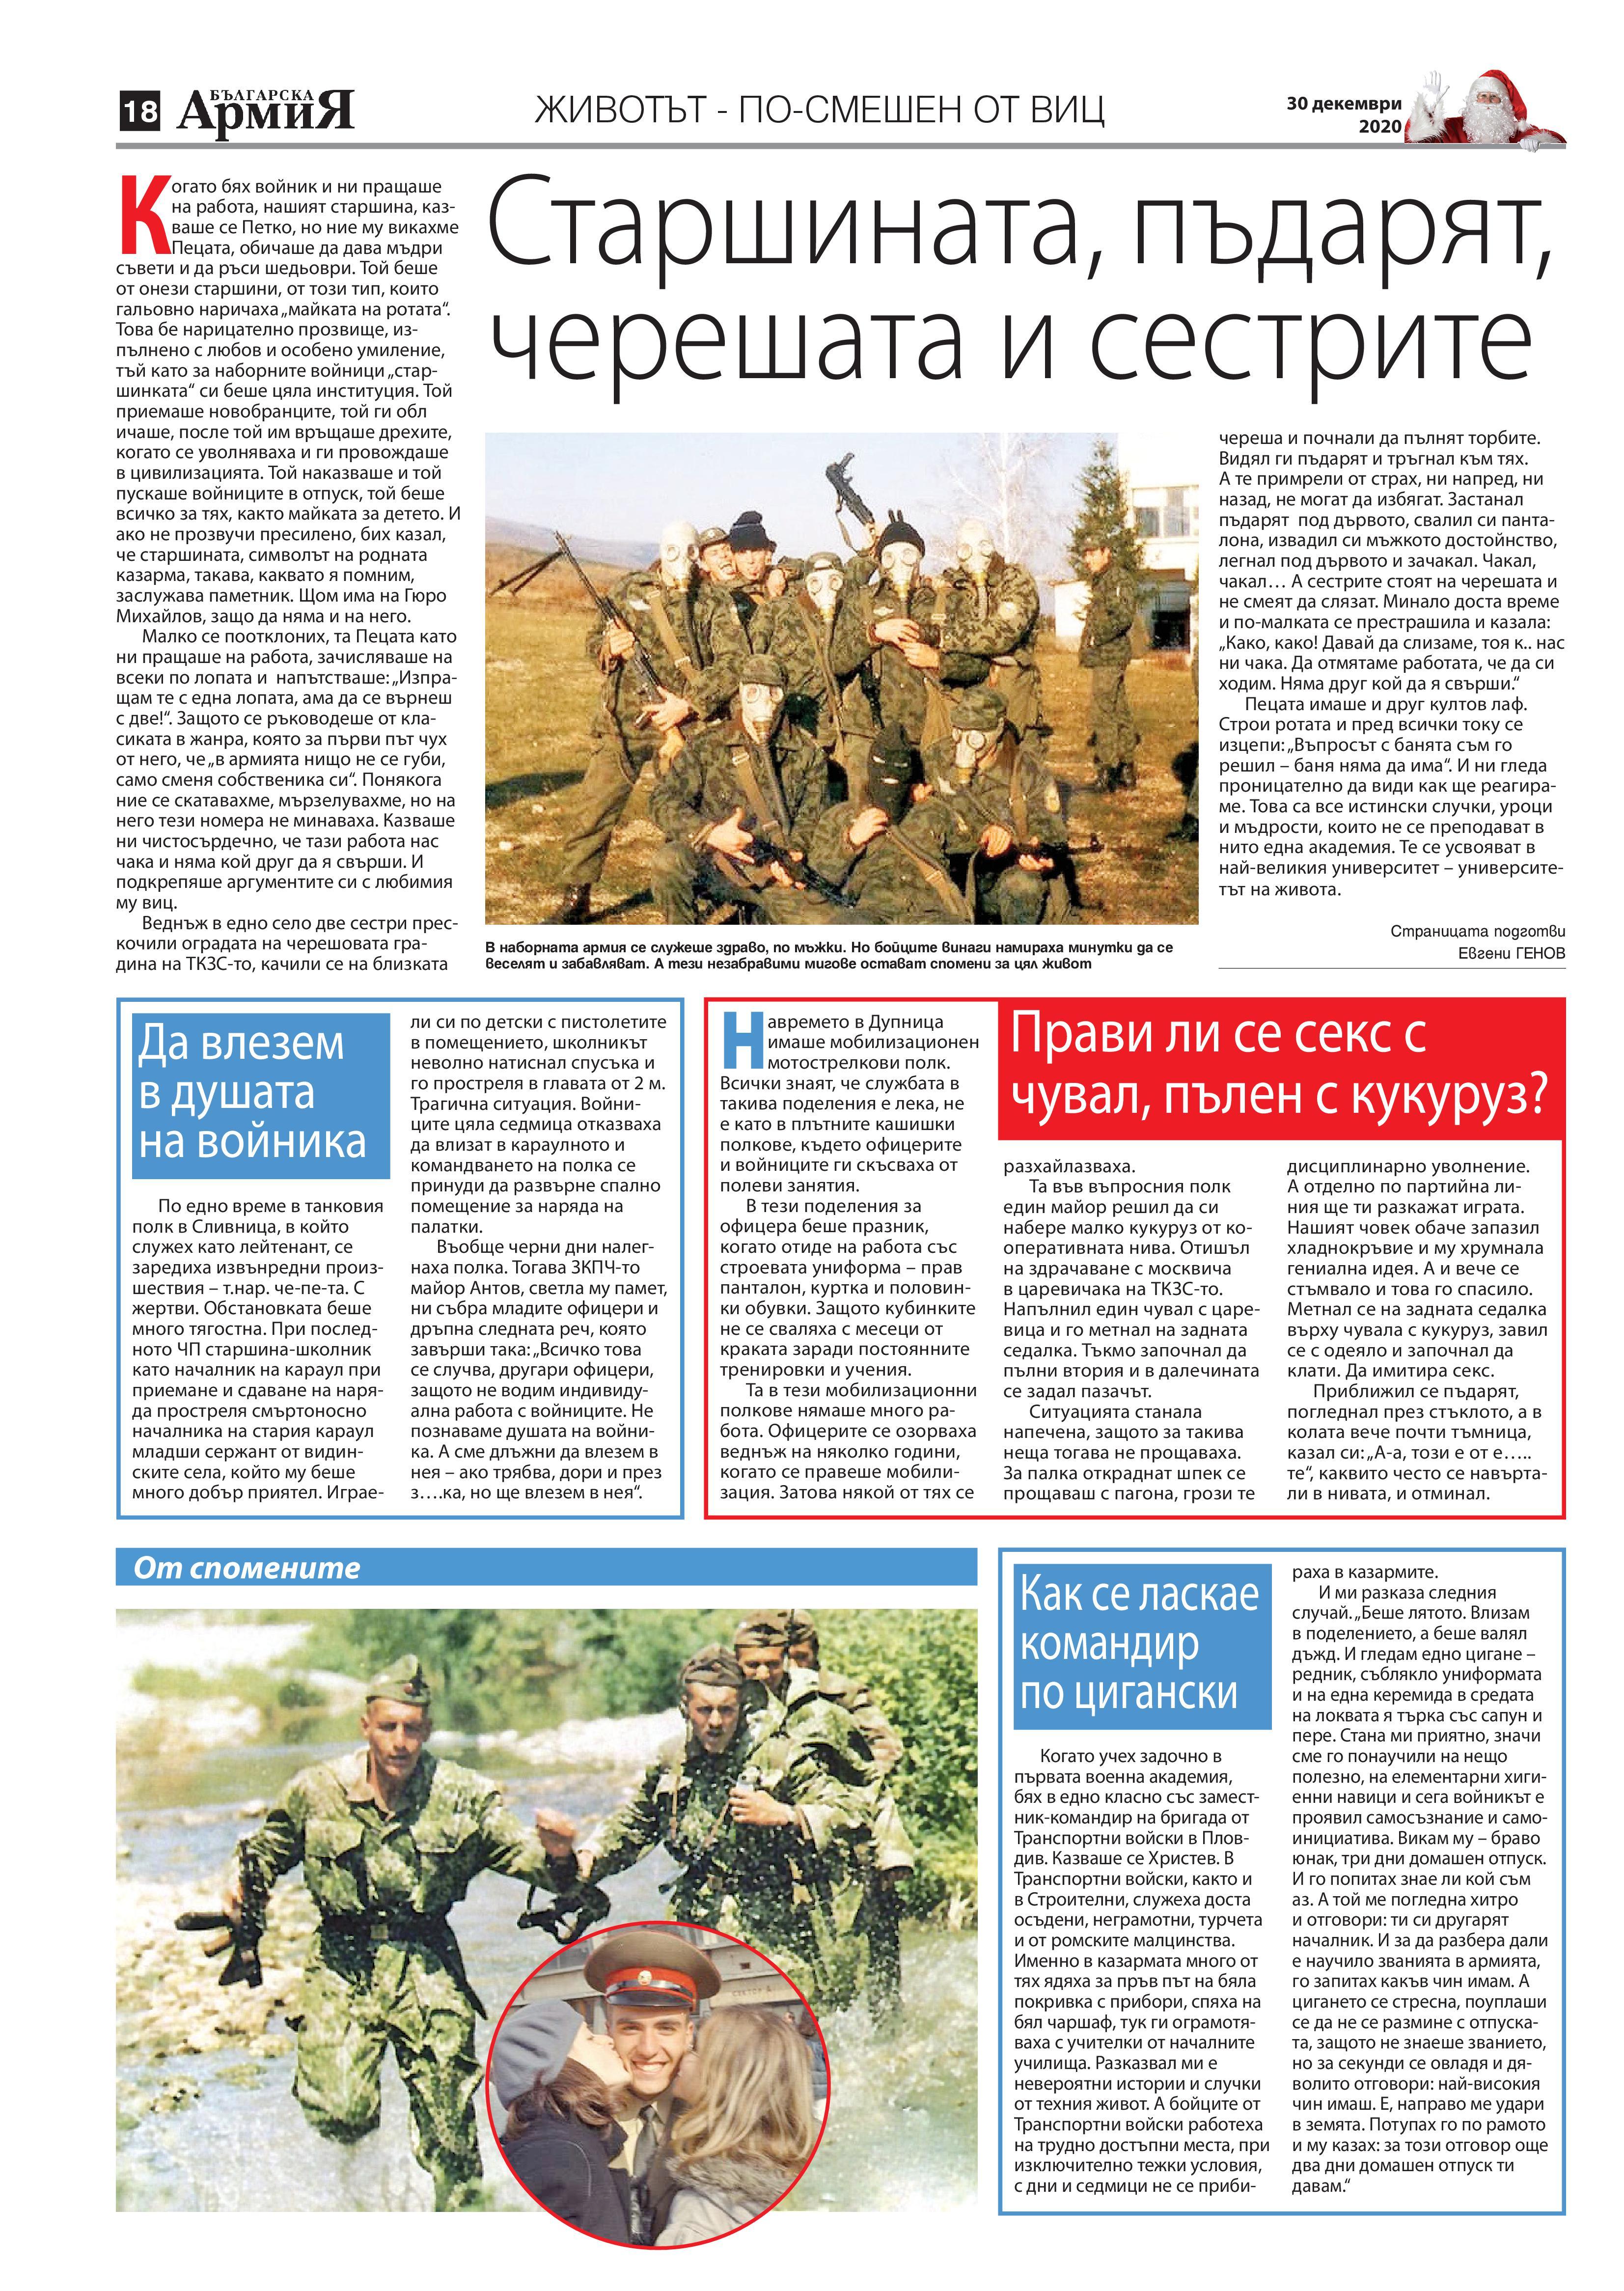 https://www.armymedia.bg/wp-content/uploads/2015/06/18-54.jpg